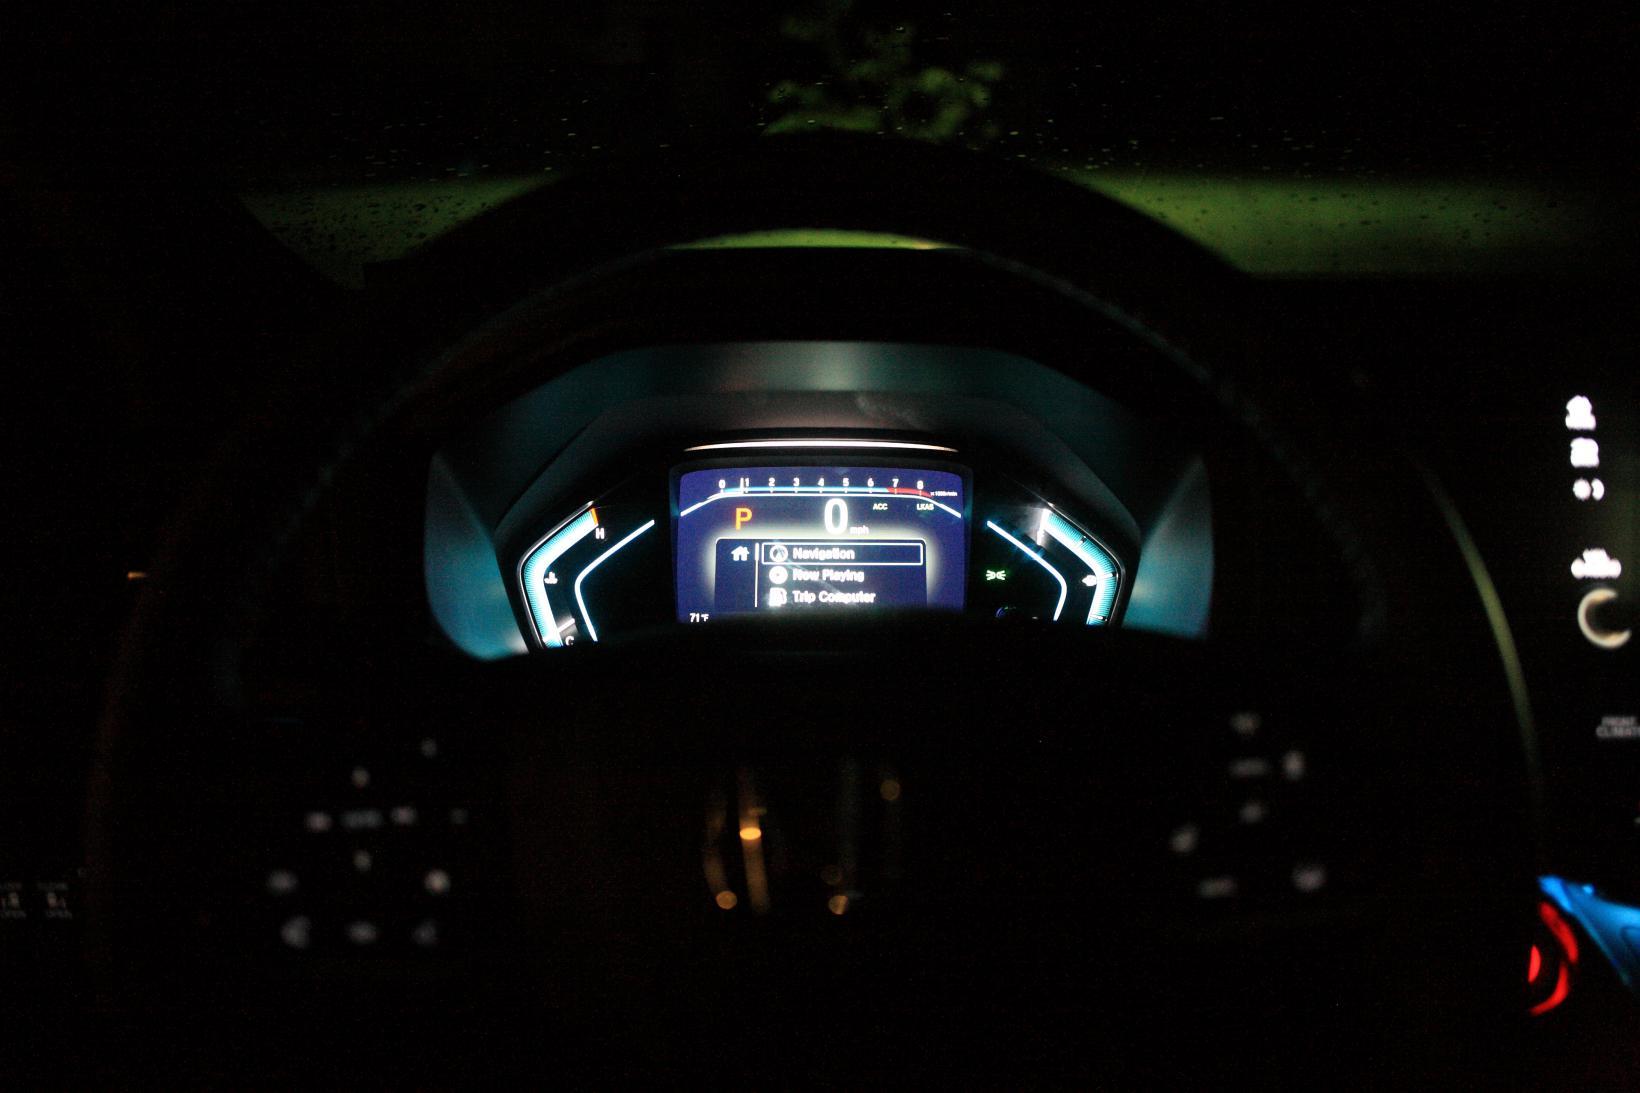 Panel and Button Lighting when Using Headlights-img_2350.jpg